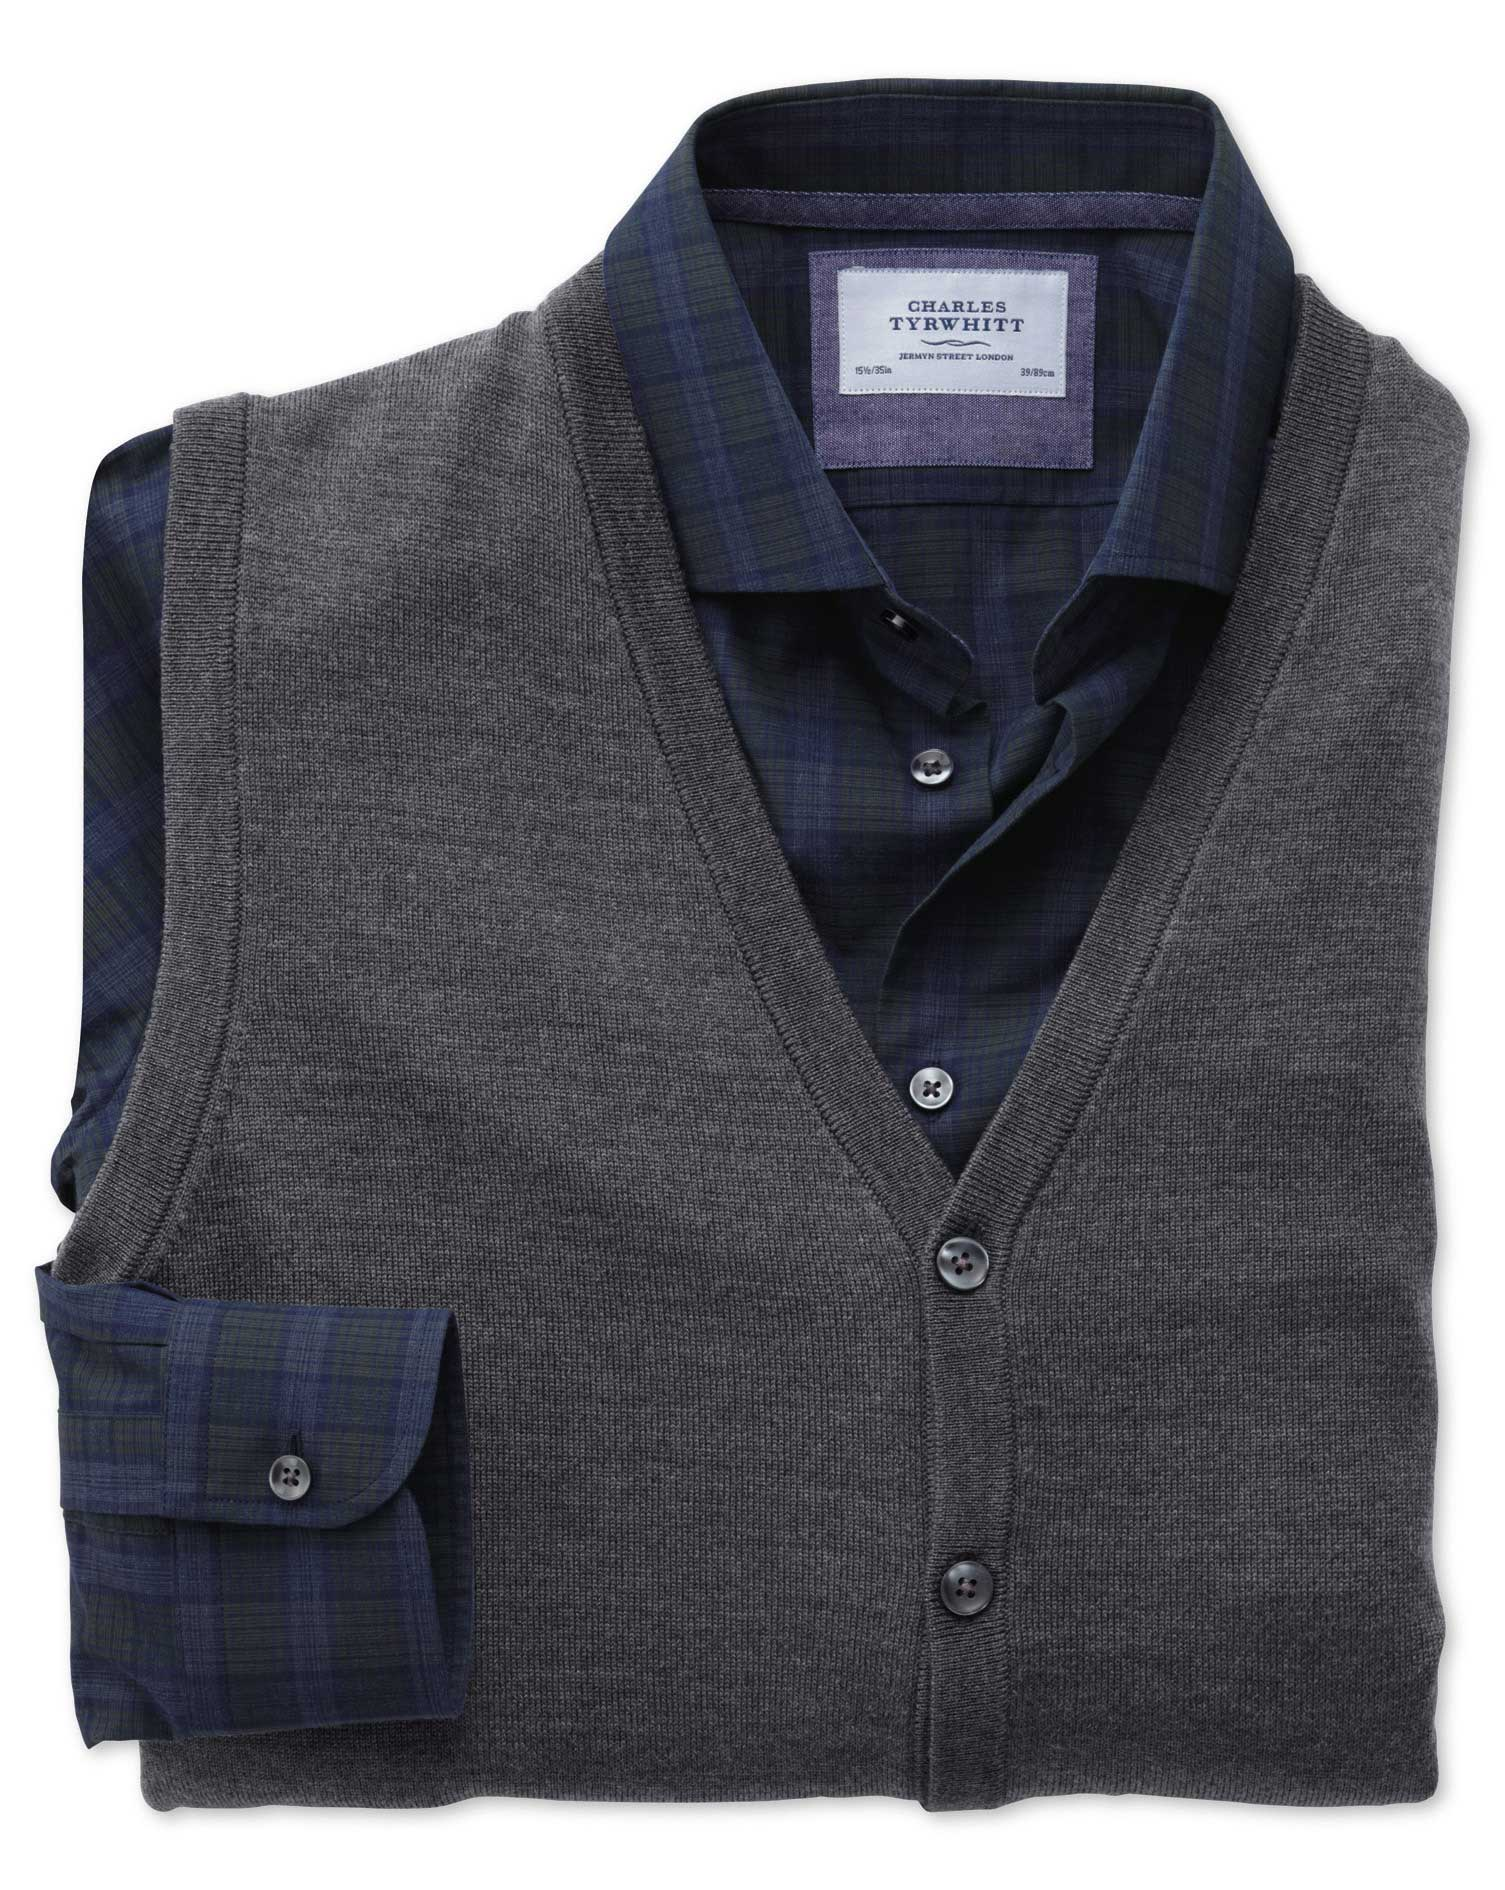 Charcoal Merino Wool Waistcoat Size XXL by Charles Tyrwhitt